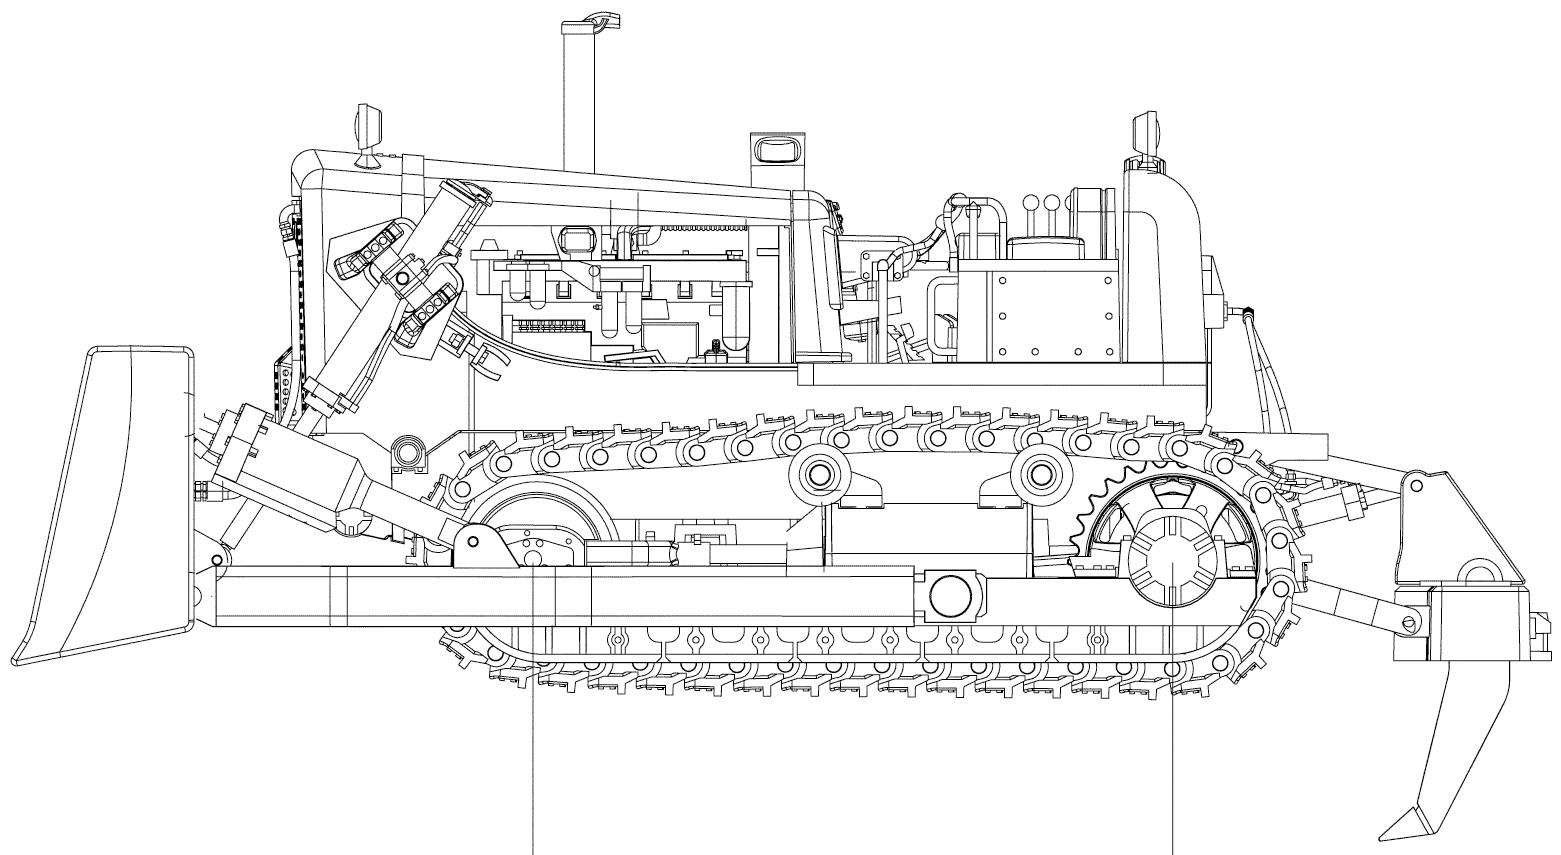 Bulldozer blueprint